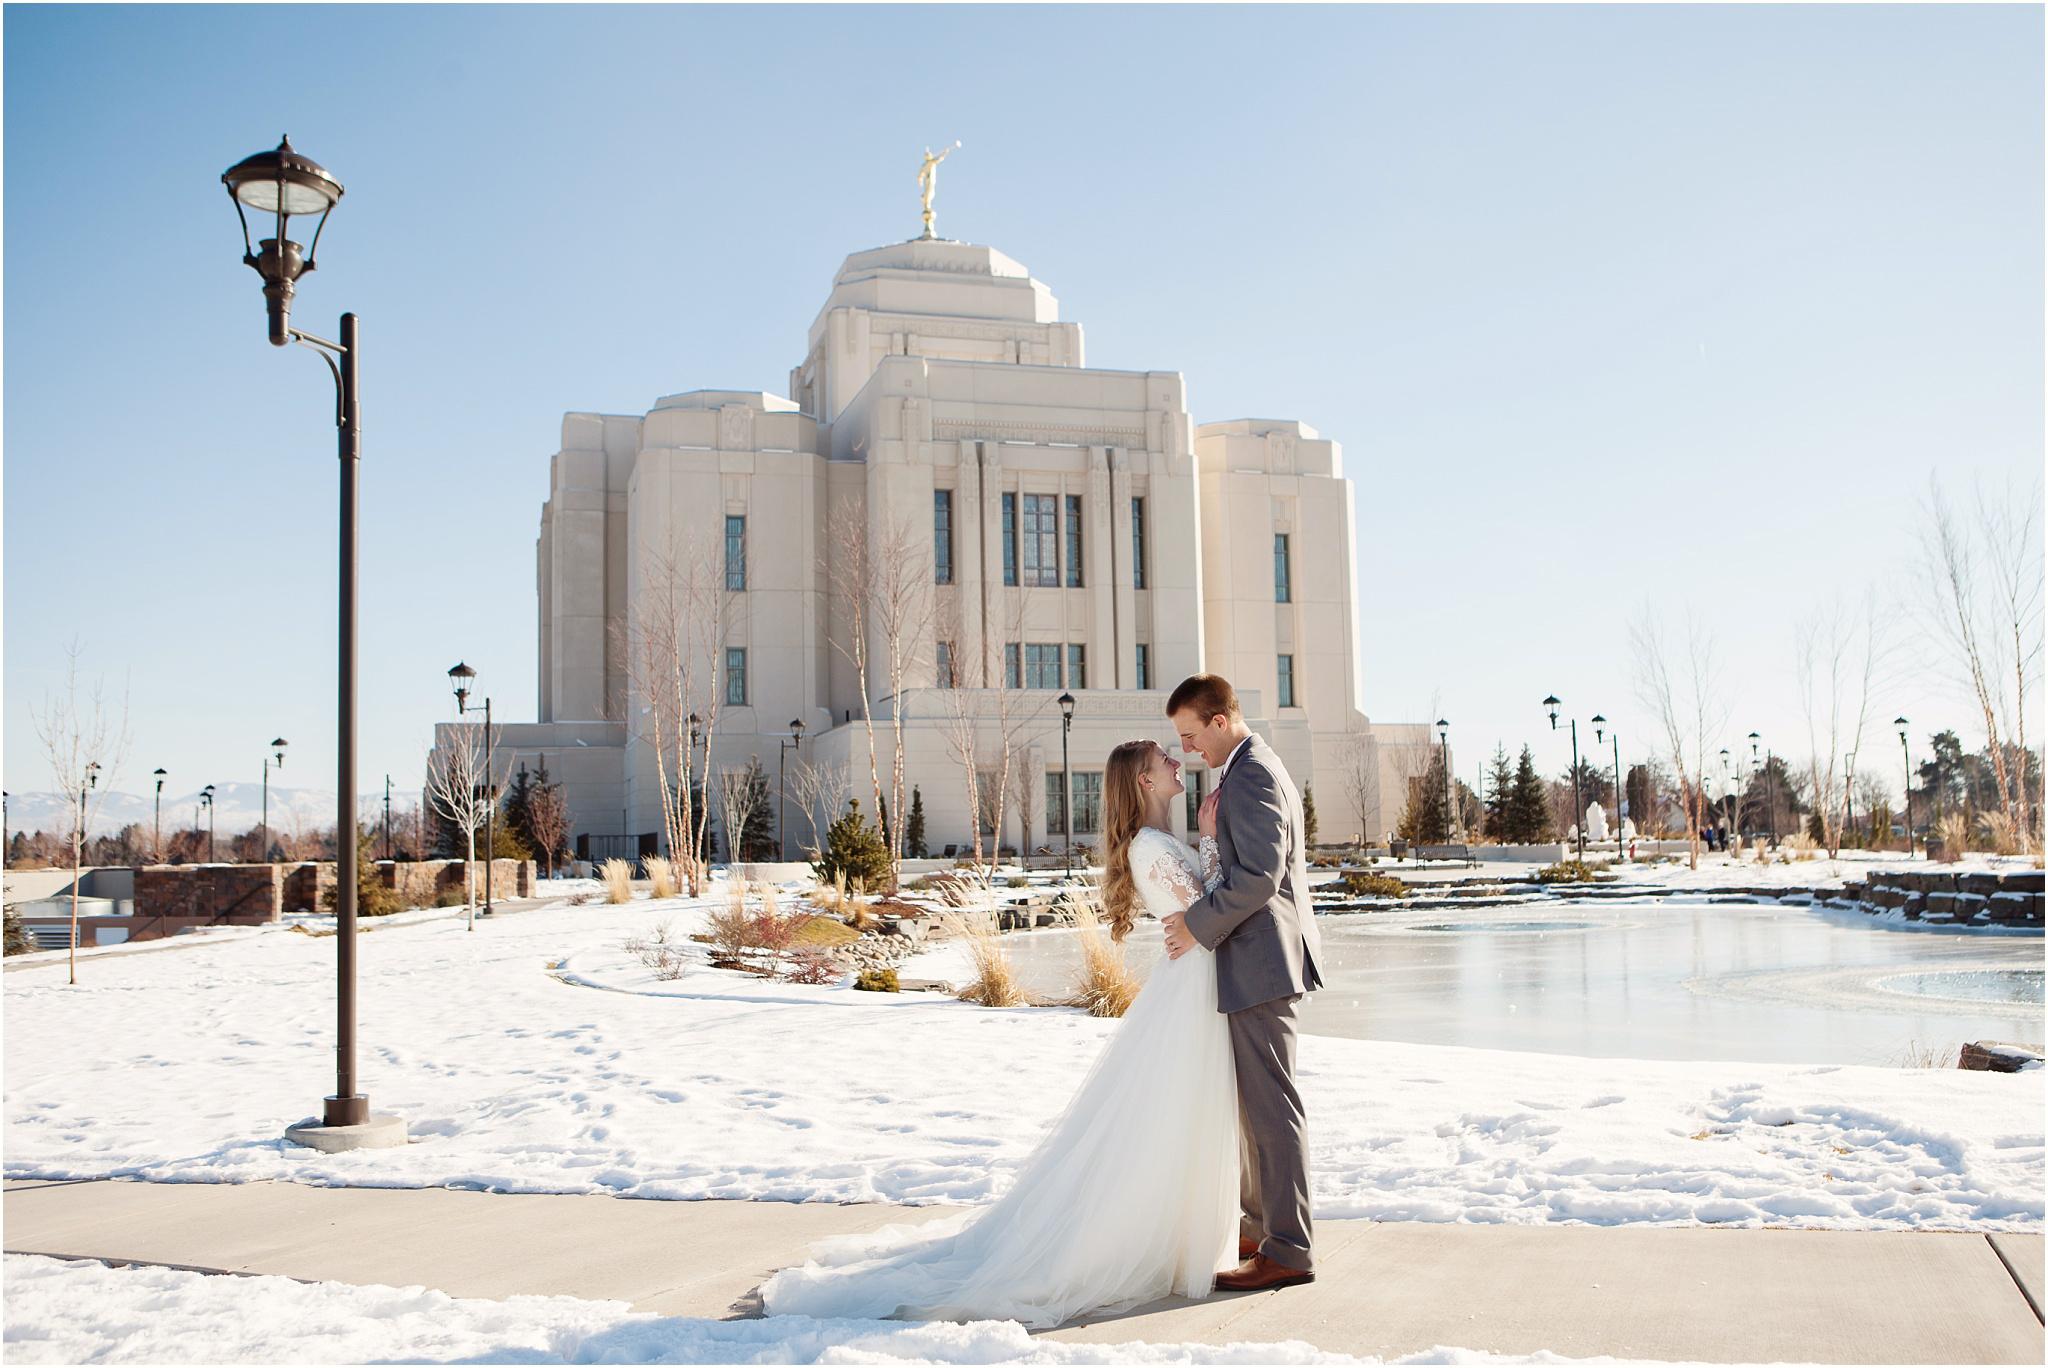 Wedding Photography_Meridian Idaho Temple_Boise Idaho_Leah Southwick Photography_0013.jpg